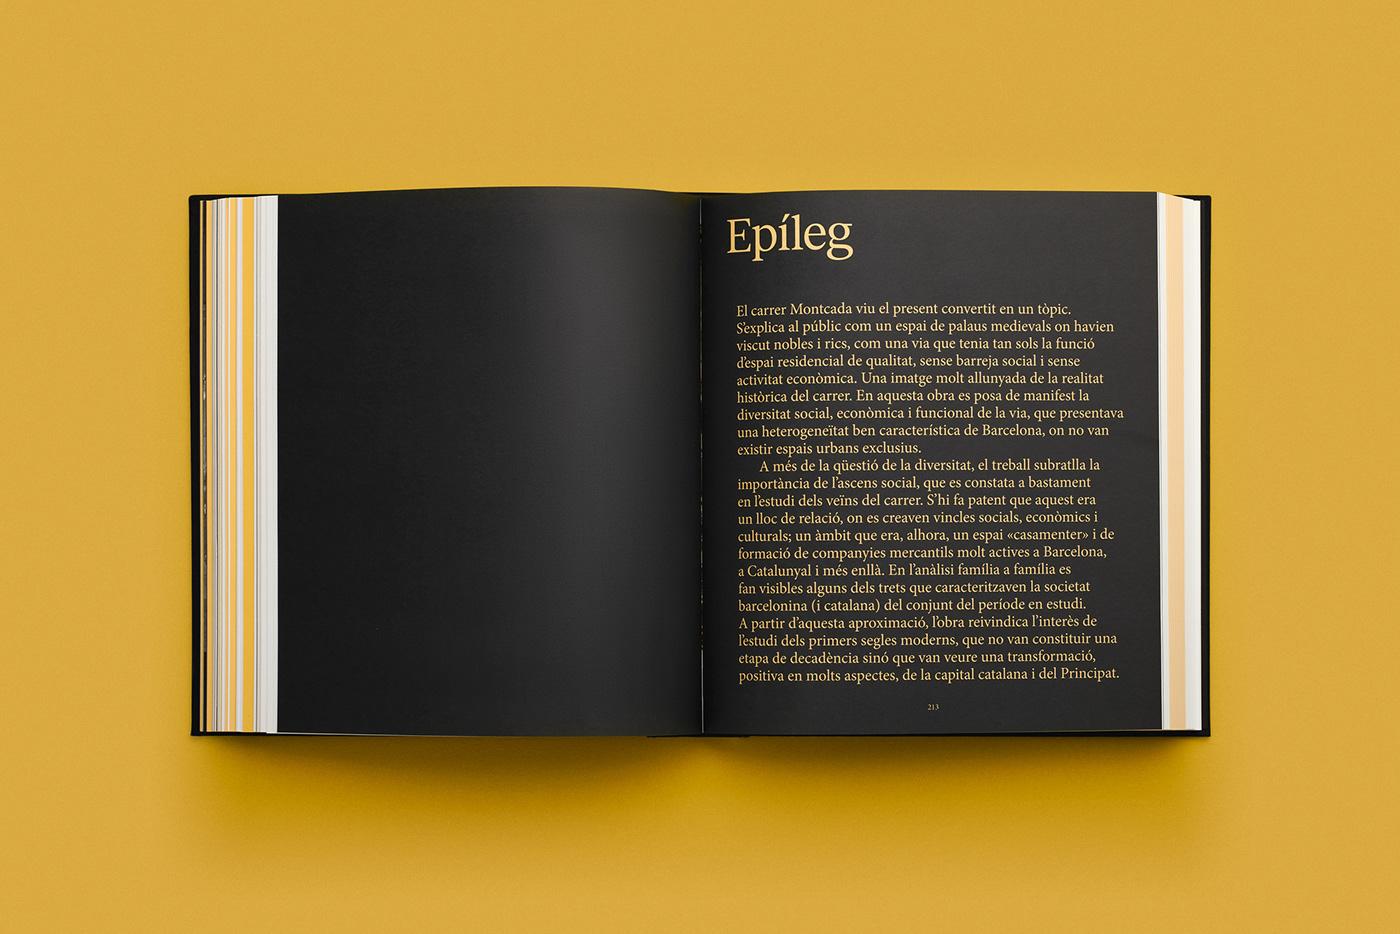 Image may contain: wall, book and yellow